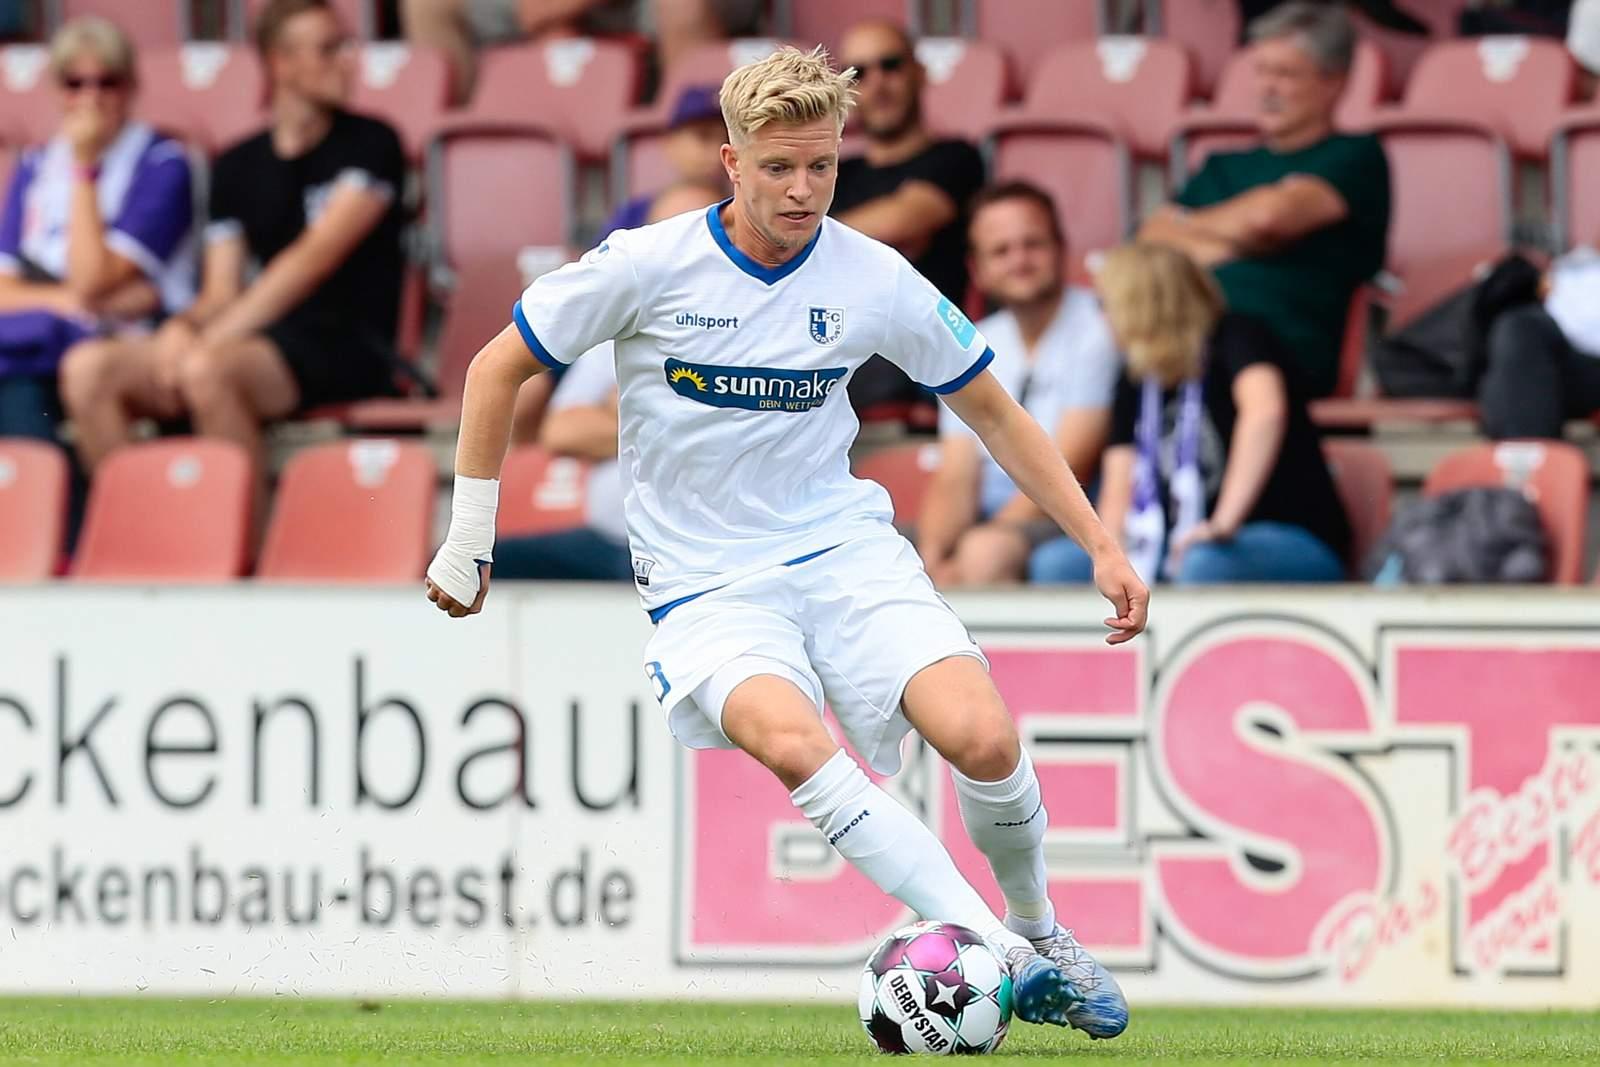 Sebastian Jakubiak vom 1. FC Magdeburg